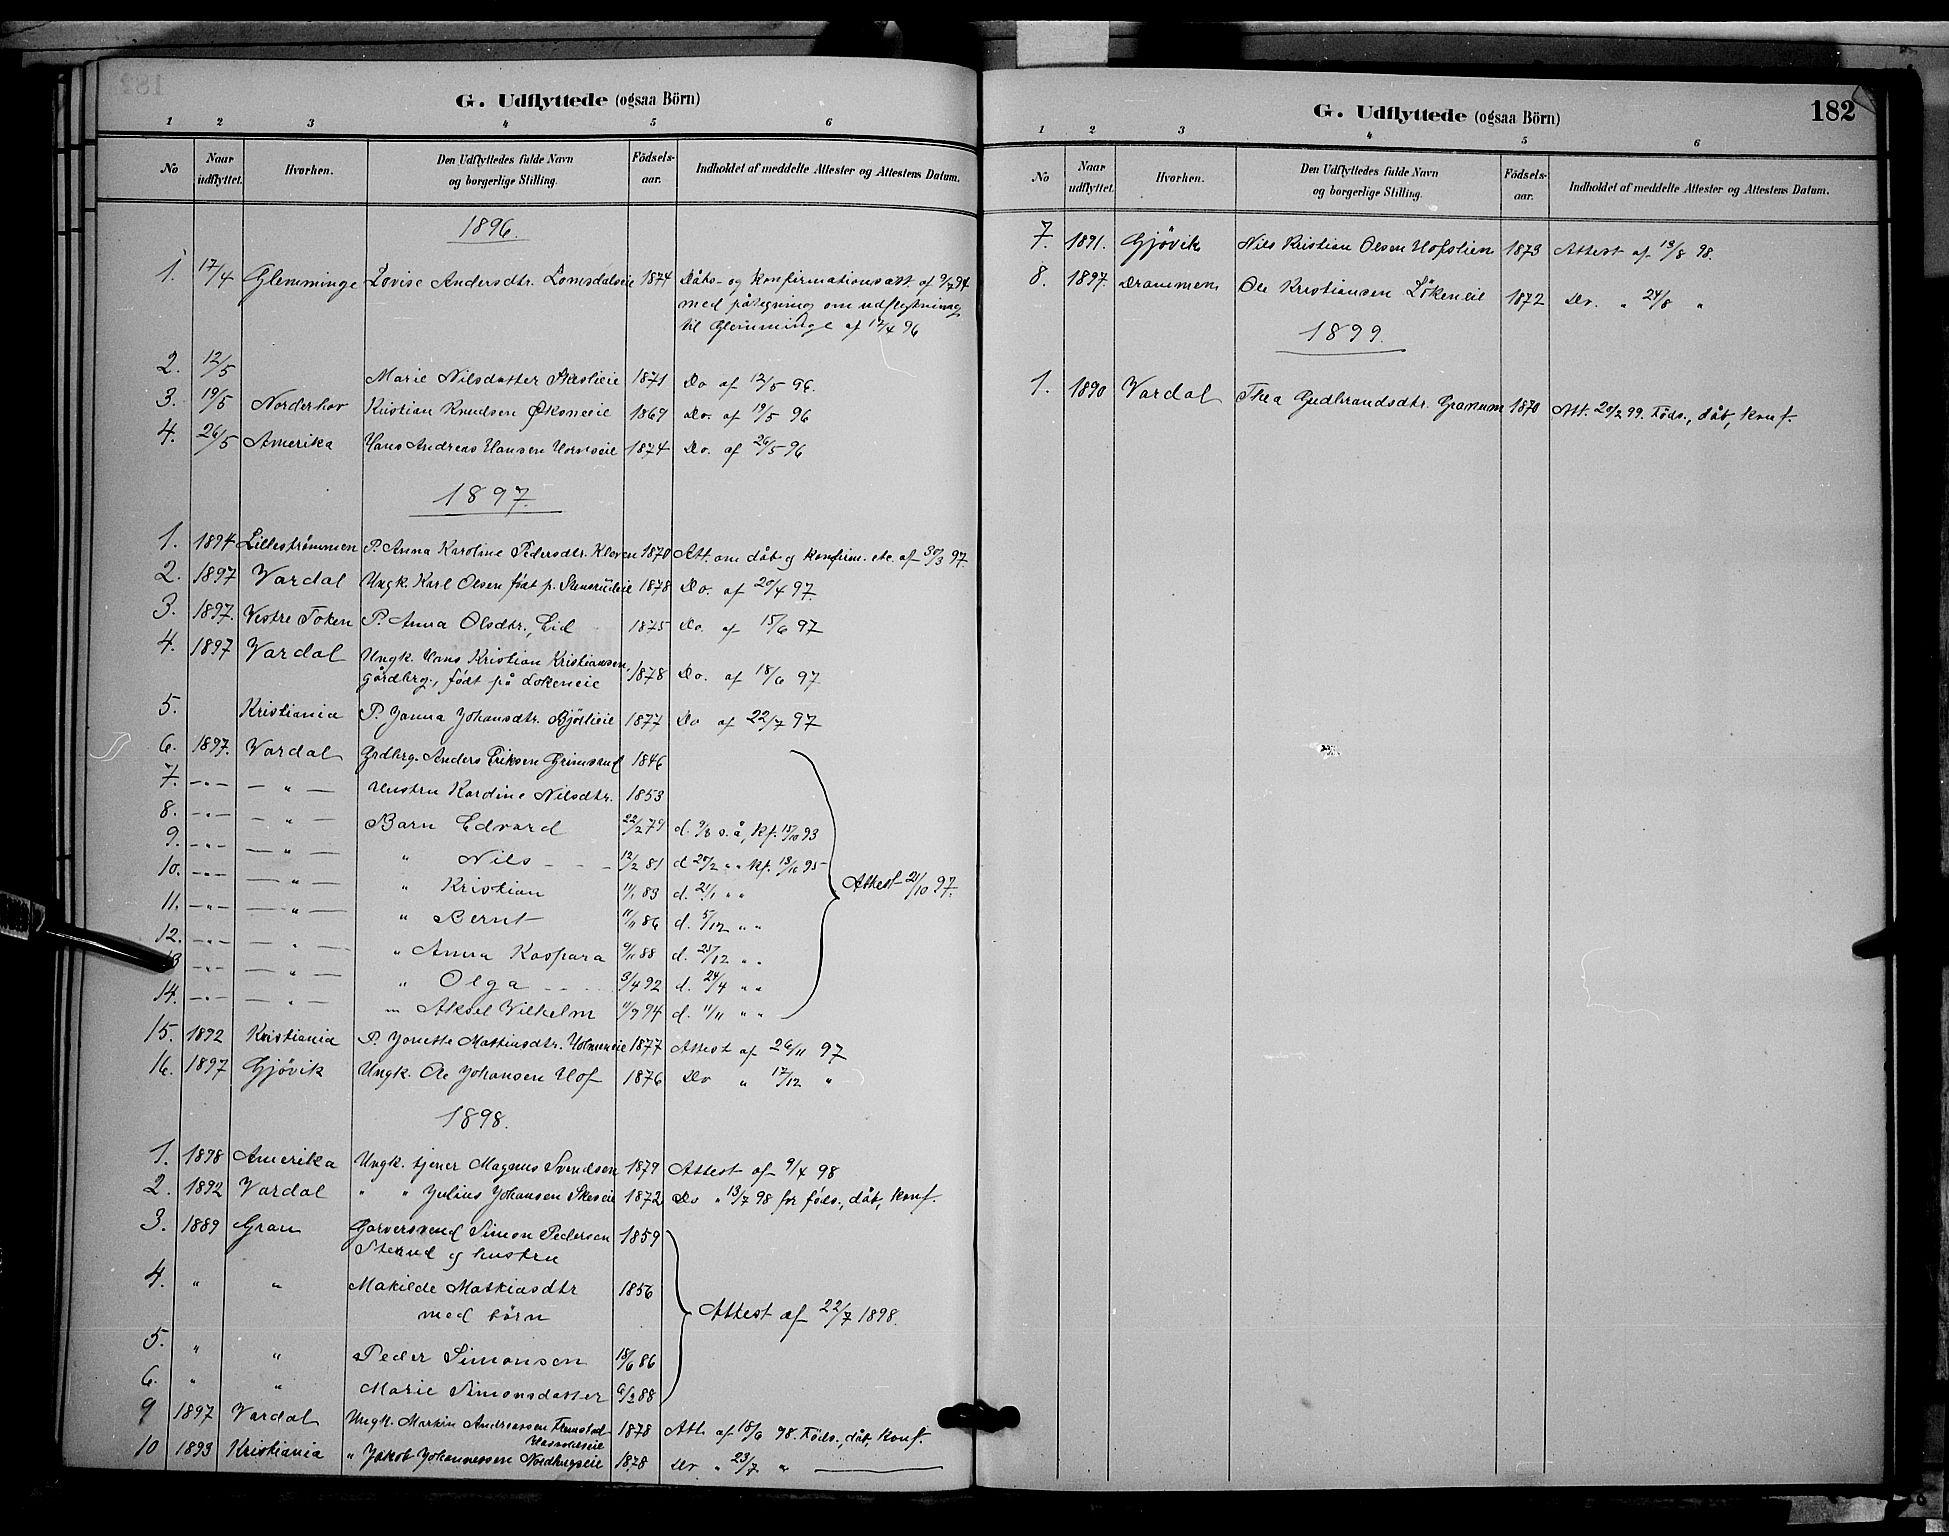 SAH, Søndre Land prestekontor, L/L0002: Klokkerbok nr. 2, 1884-1900, s. 182